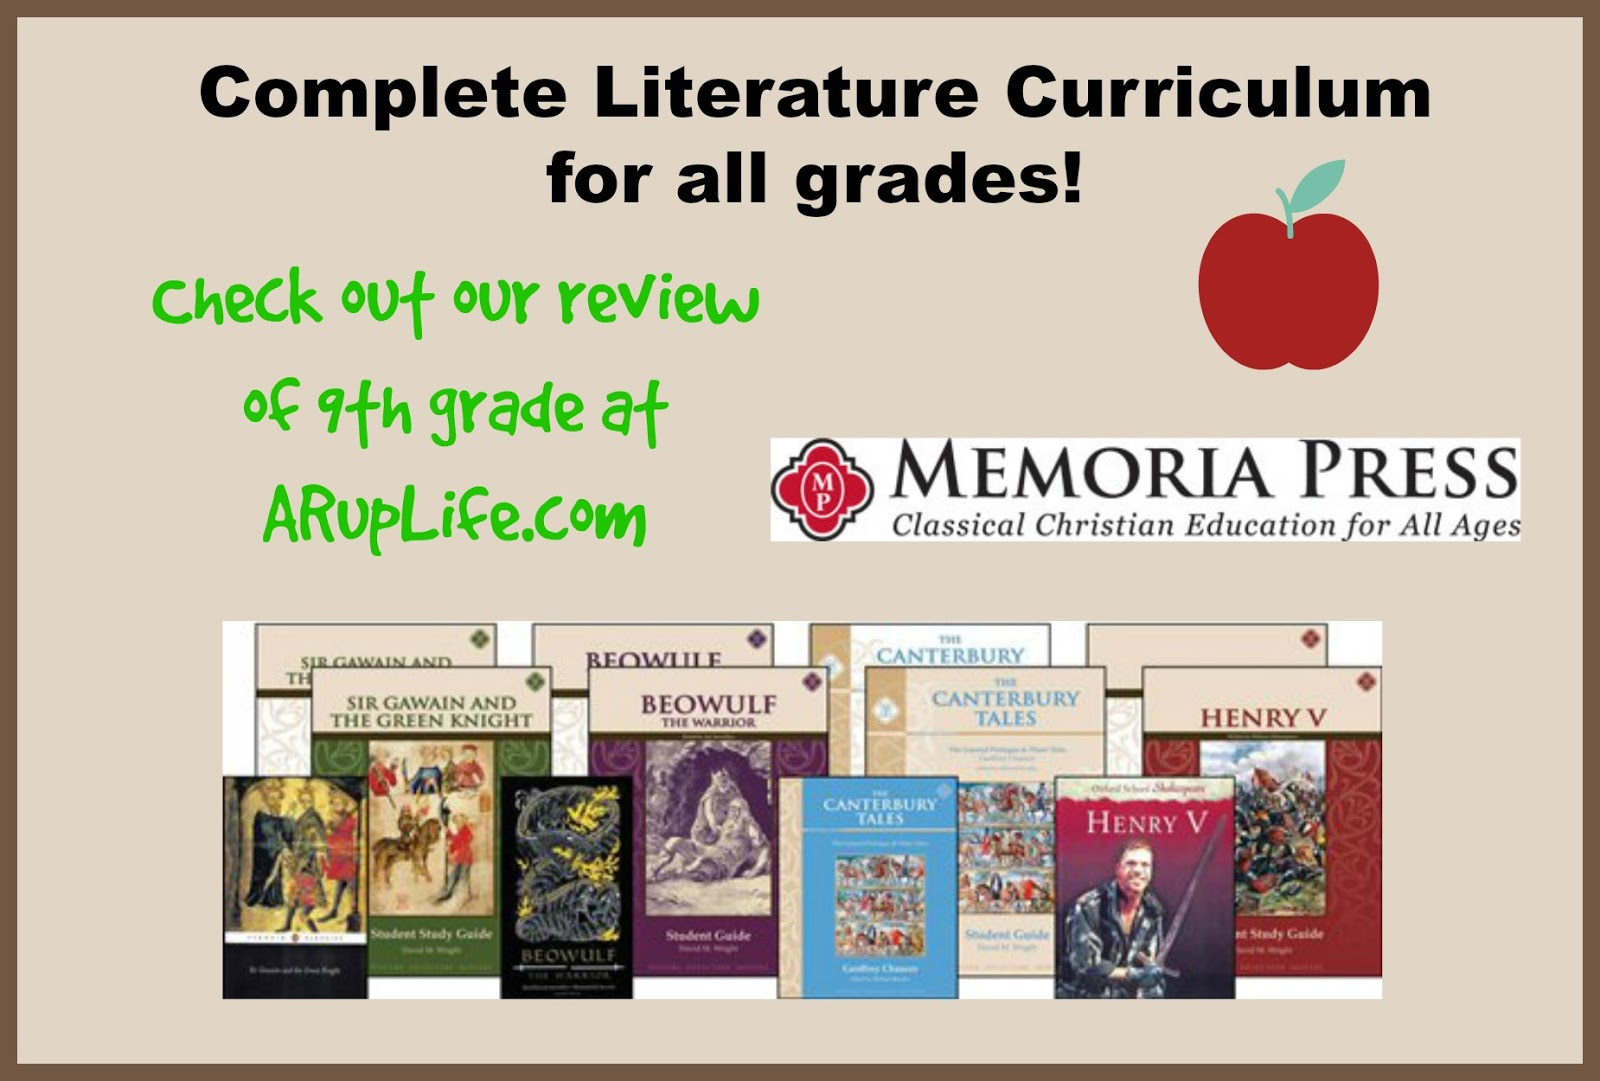 A Rup Life Memoria Press 9th Grade Literature Review